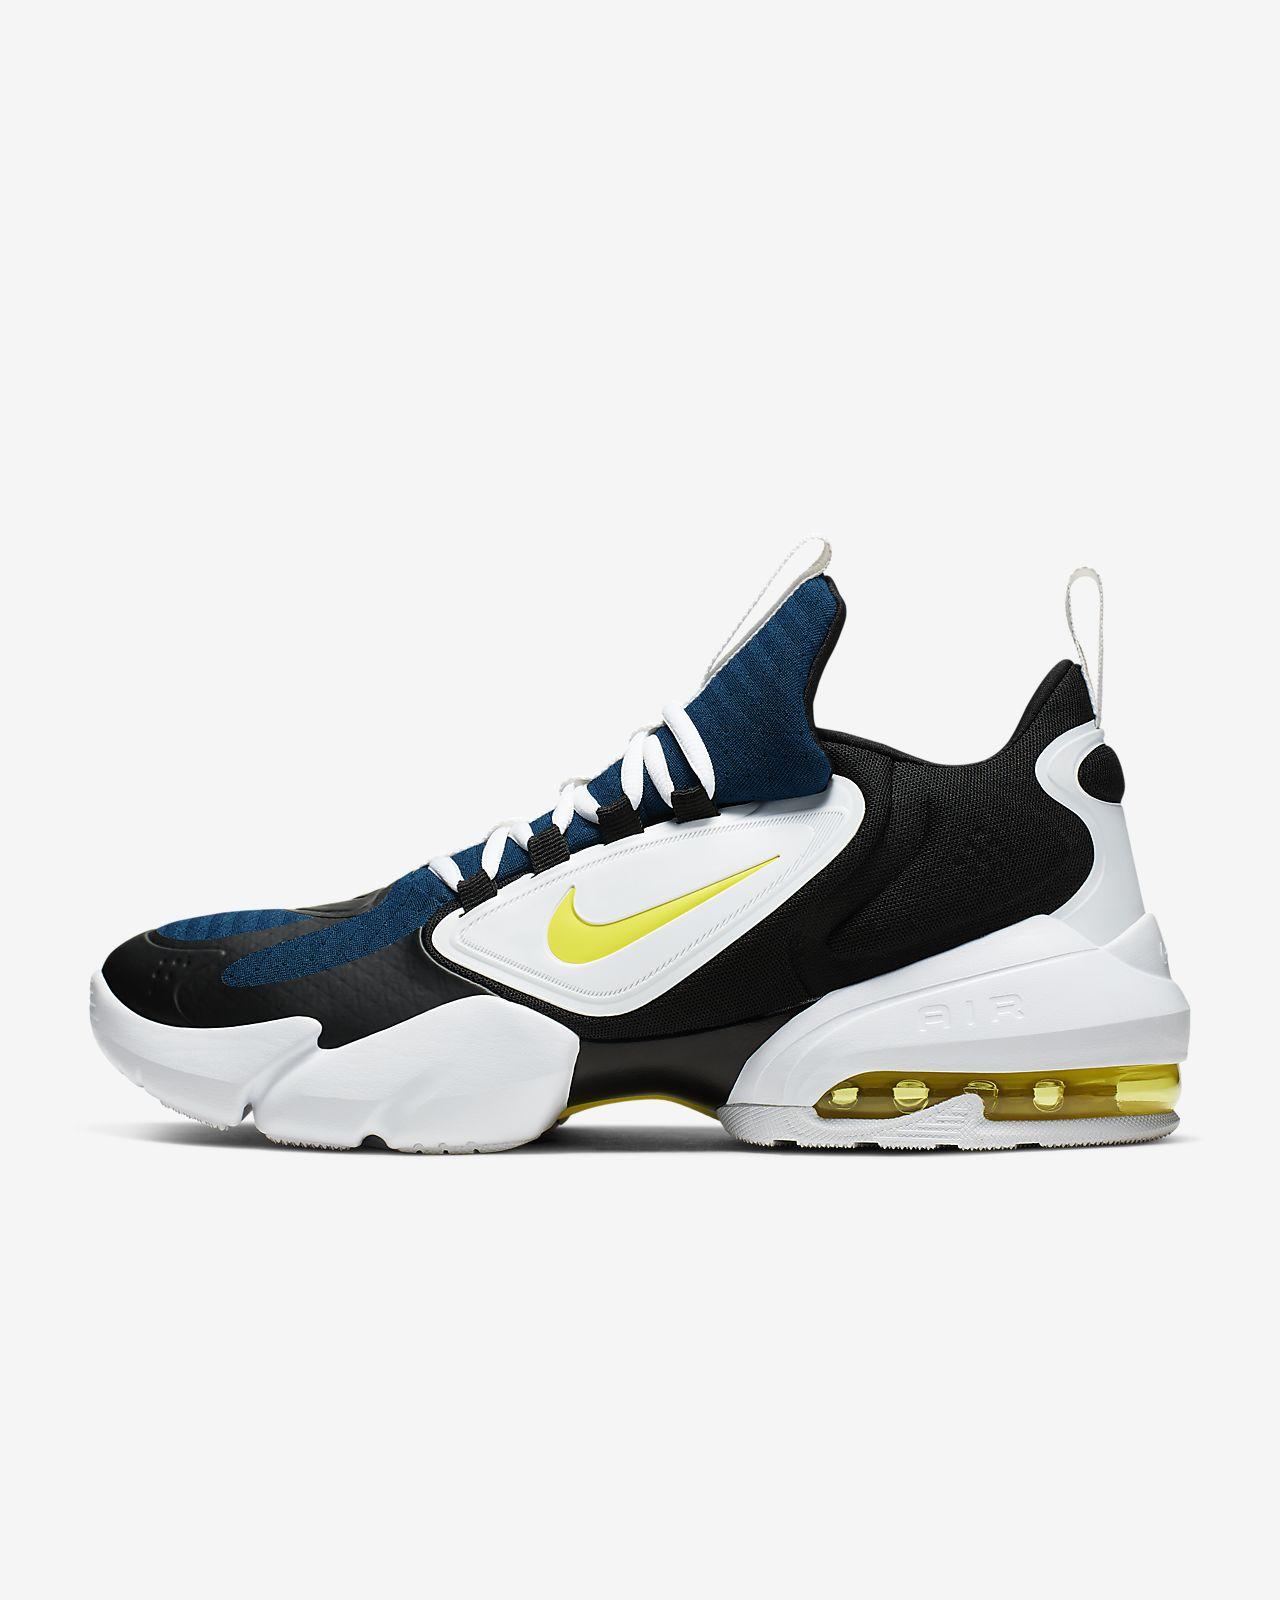 Męskie buty treningowe Nike Air Max Alpha Savage